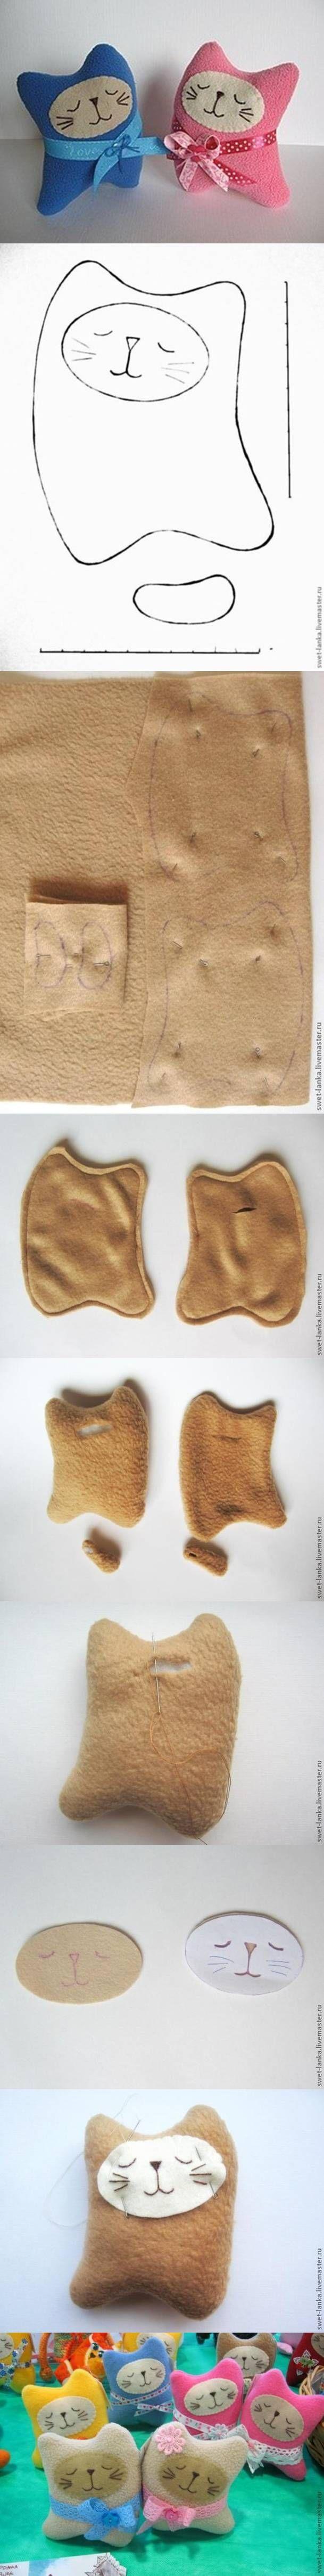 DIY Lovely Fabric Kitty